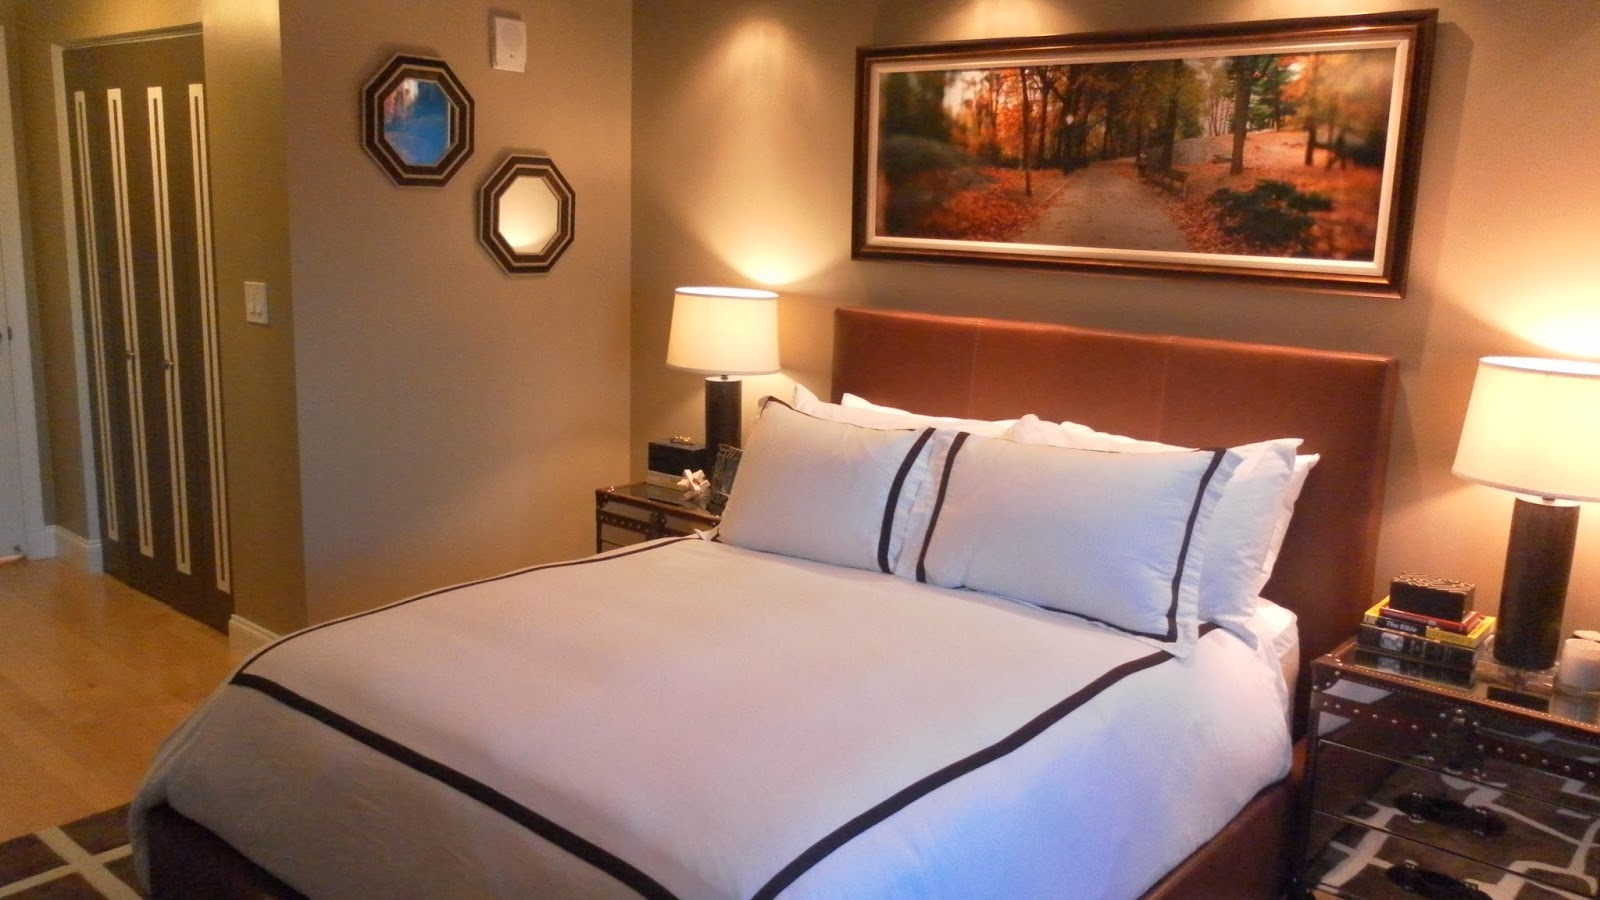 bachelor pad the bedroom its a wrap bachelor bedroom furniture